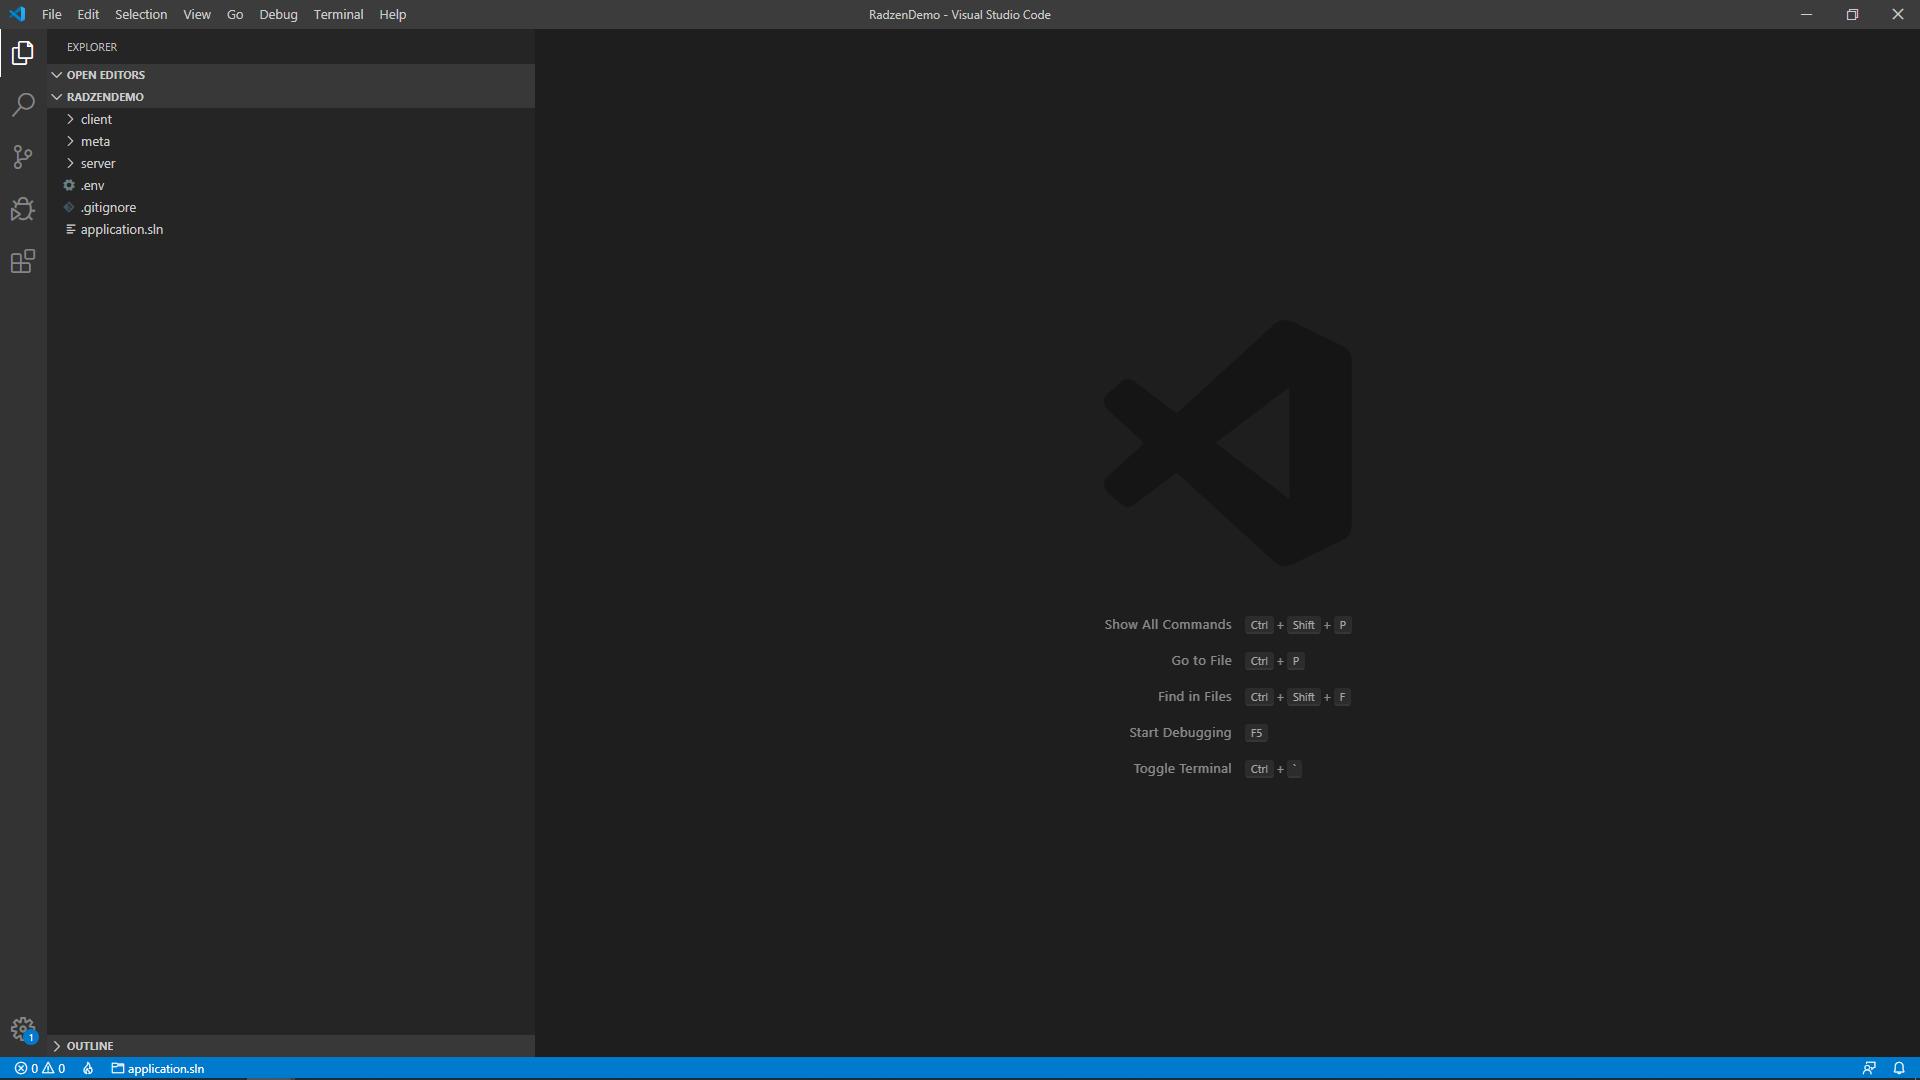 Run with Visual Studio